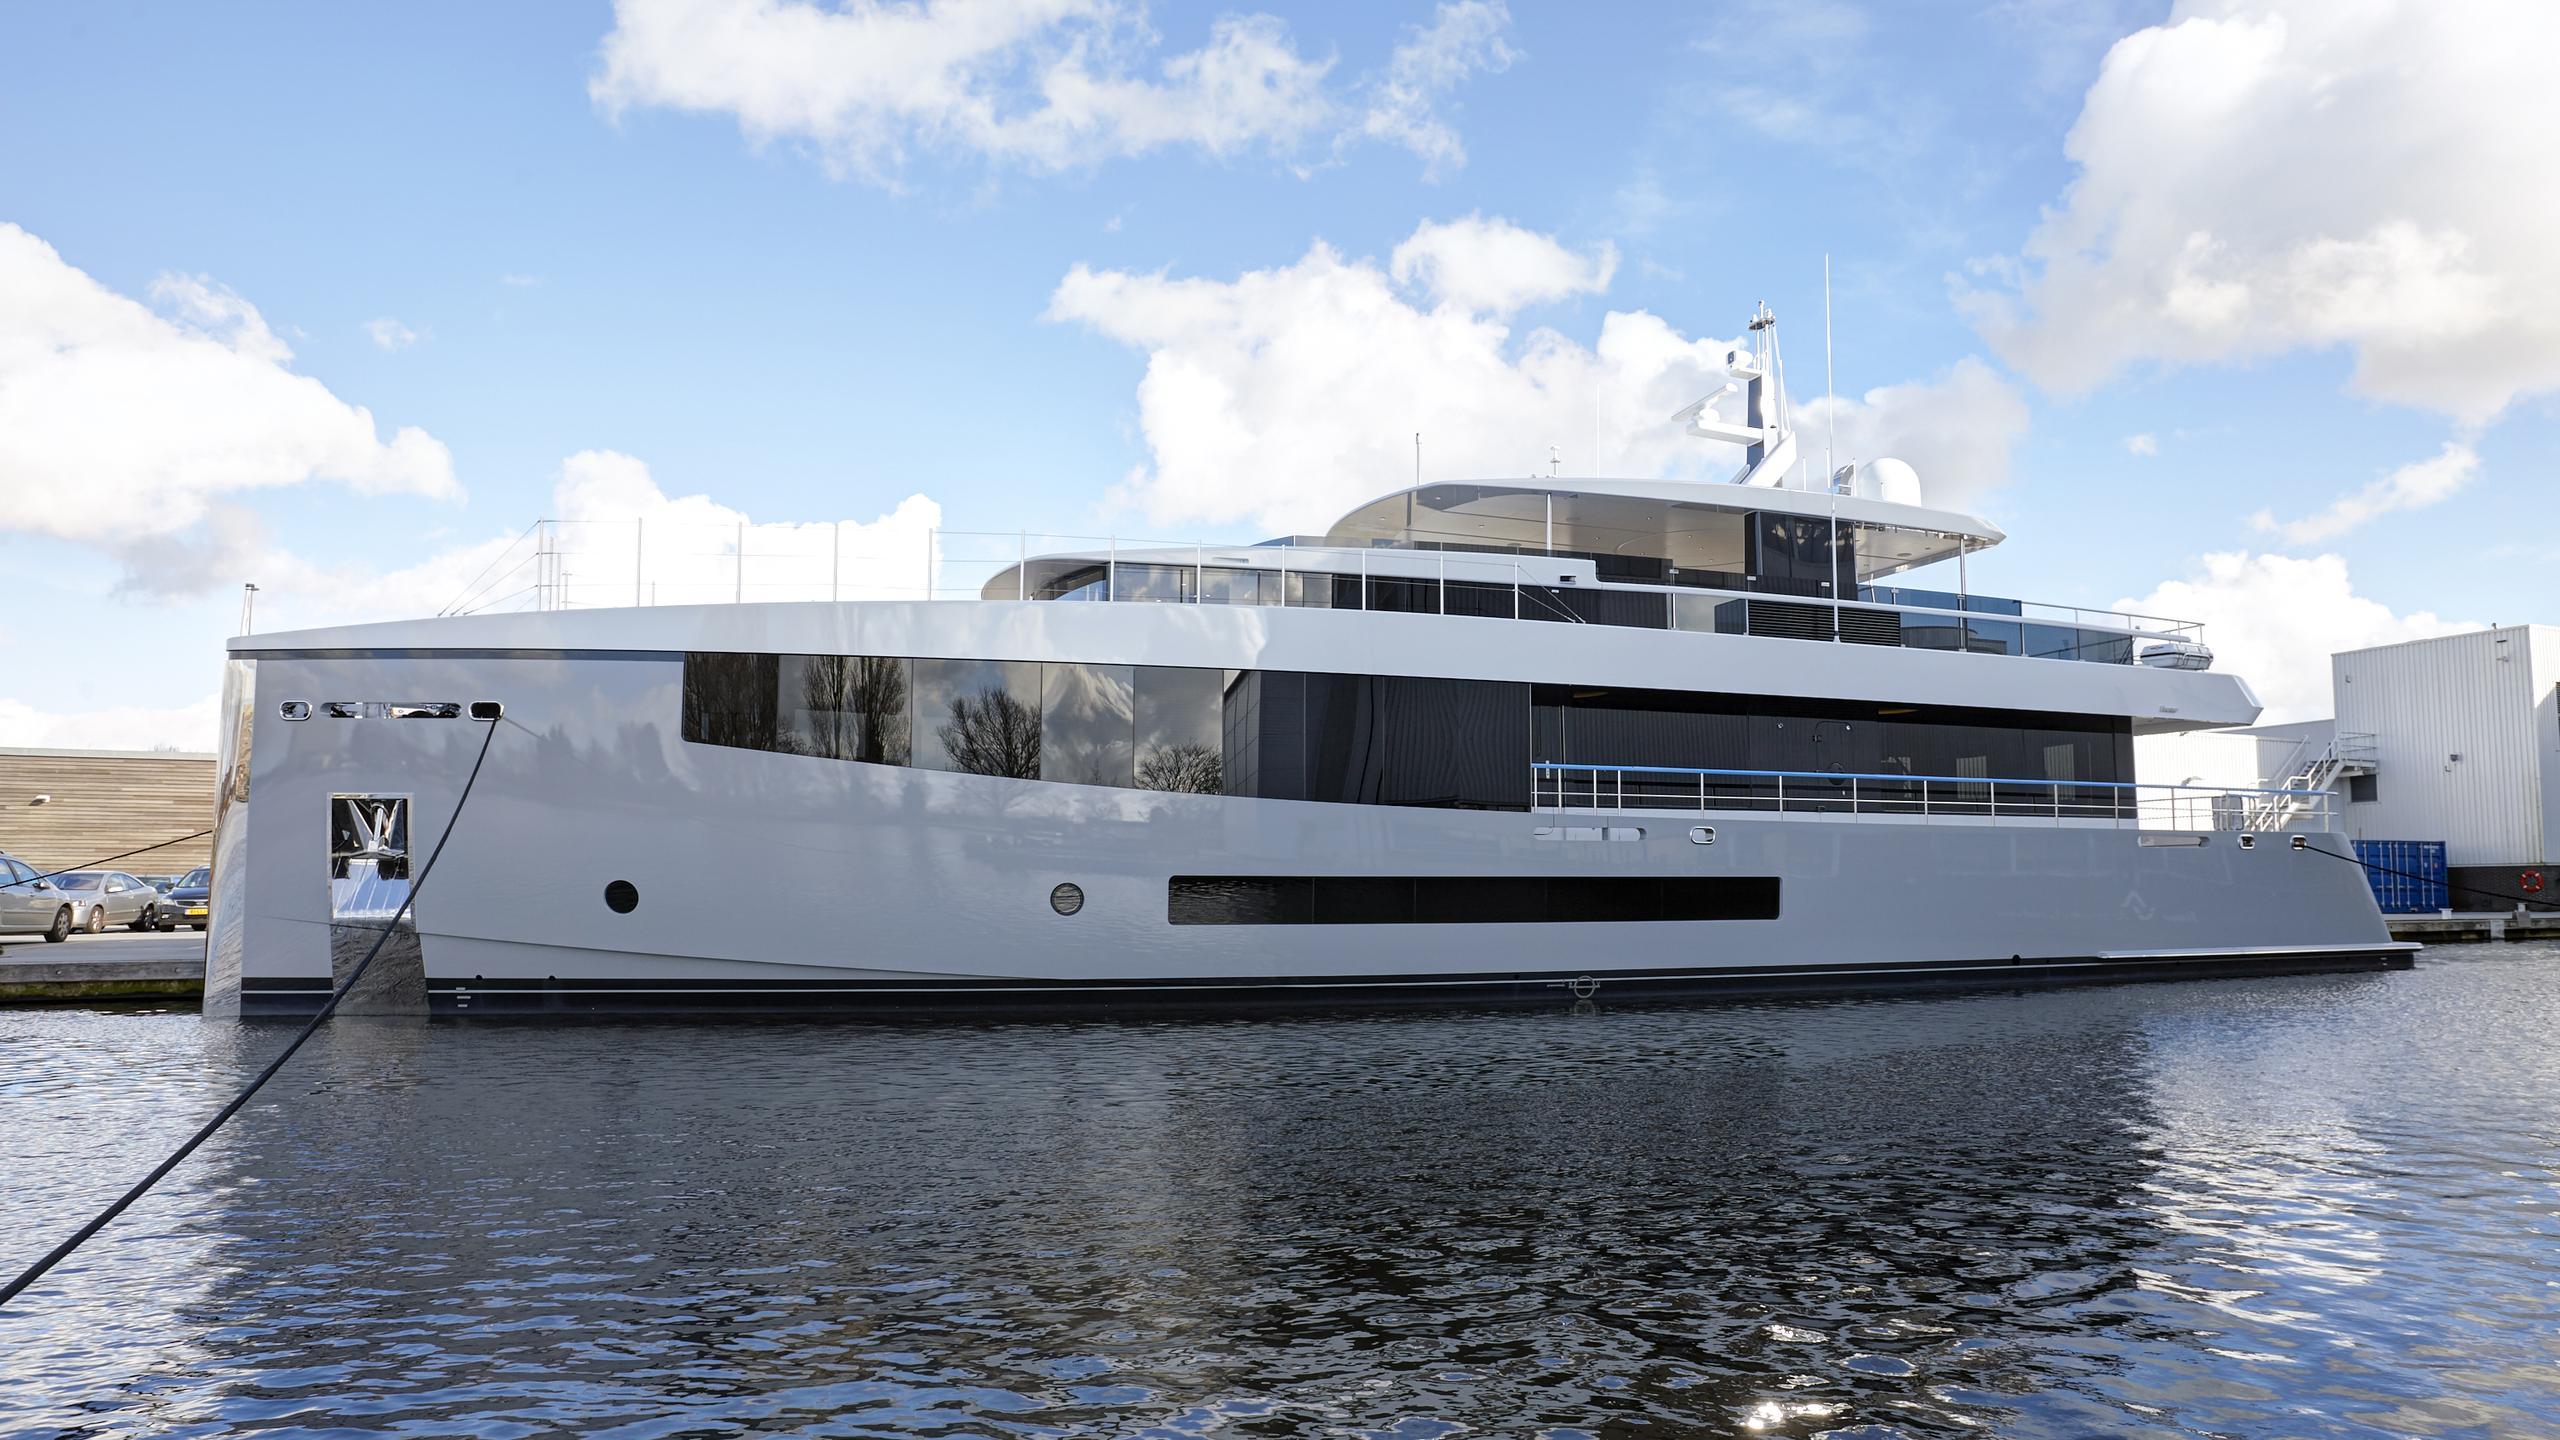 feadship-hull-692-2016-34m-de-voogt-bannenberg-rowell-yacht-exterior